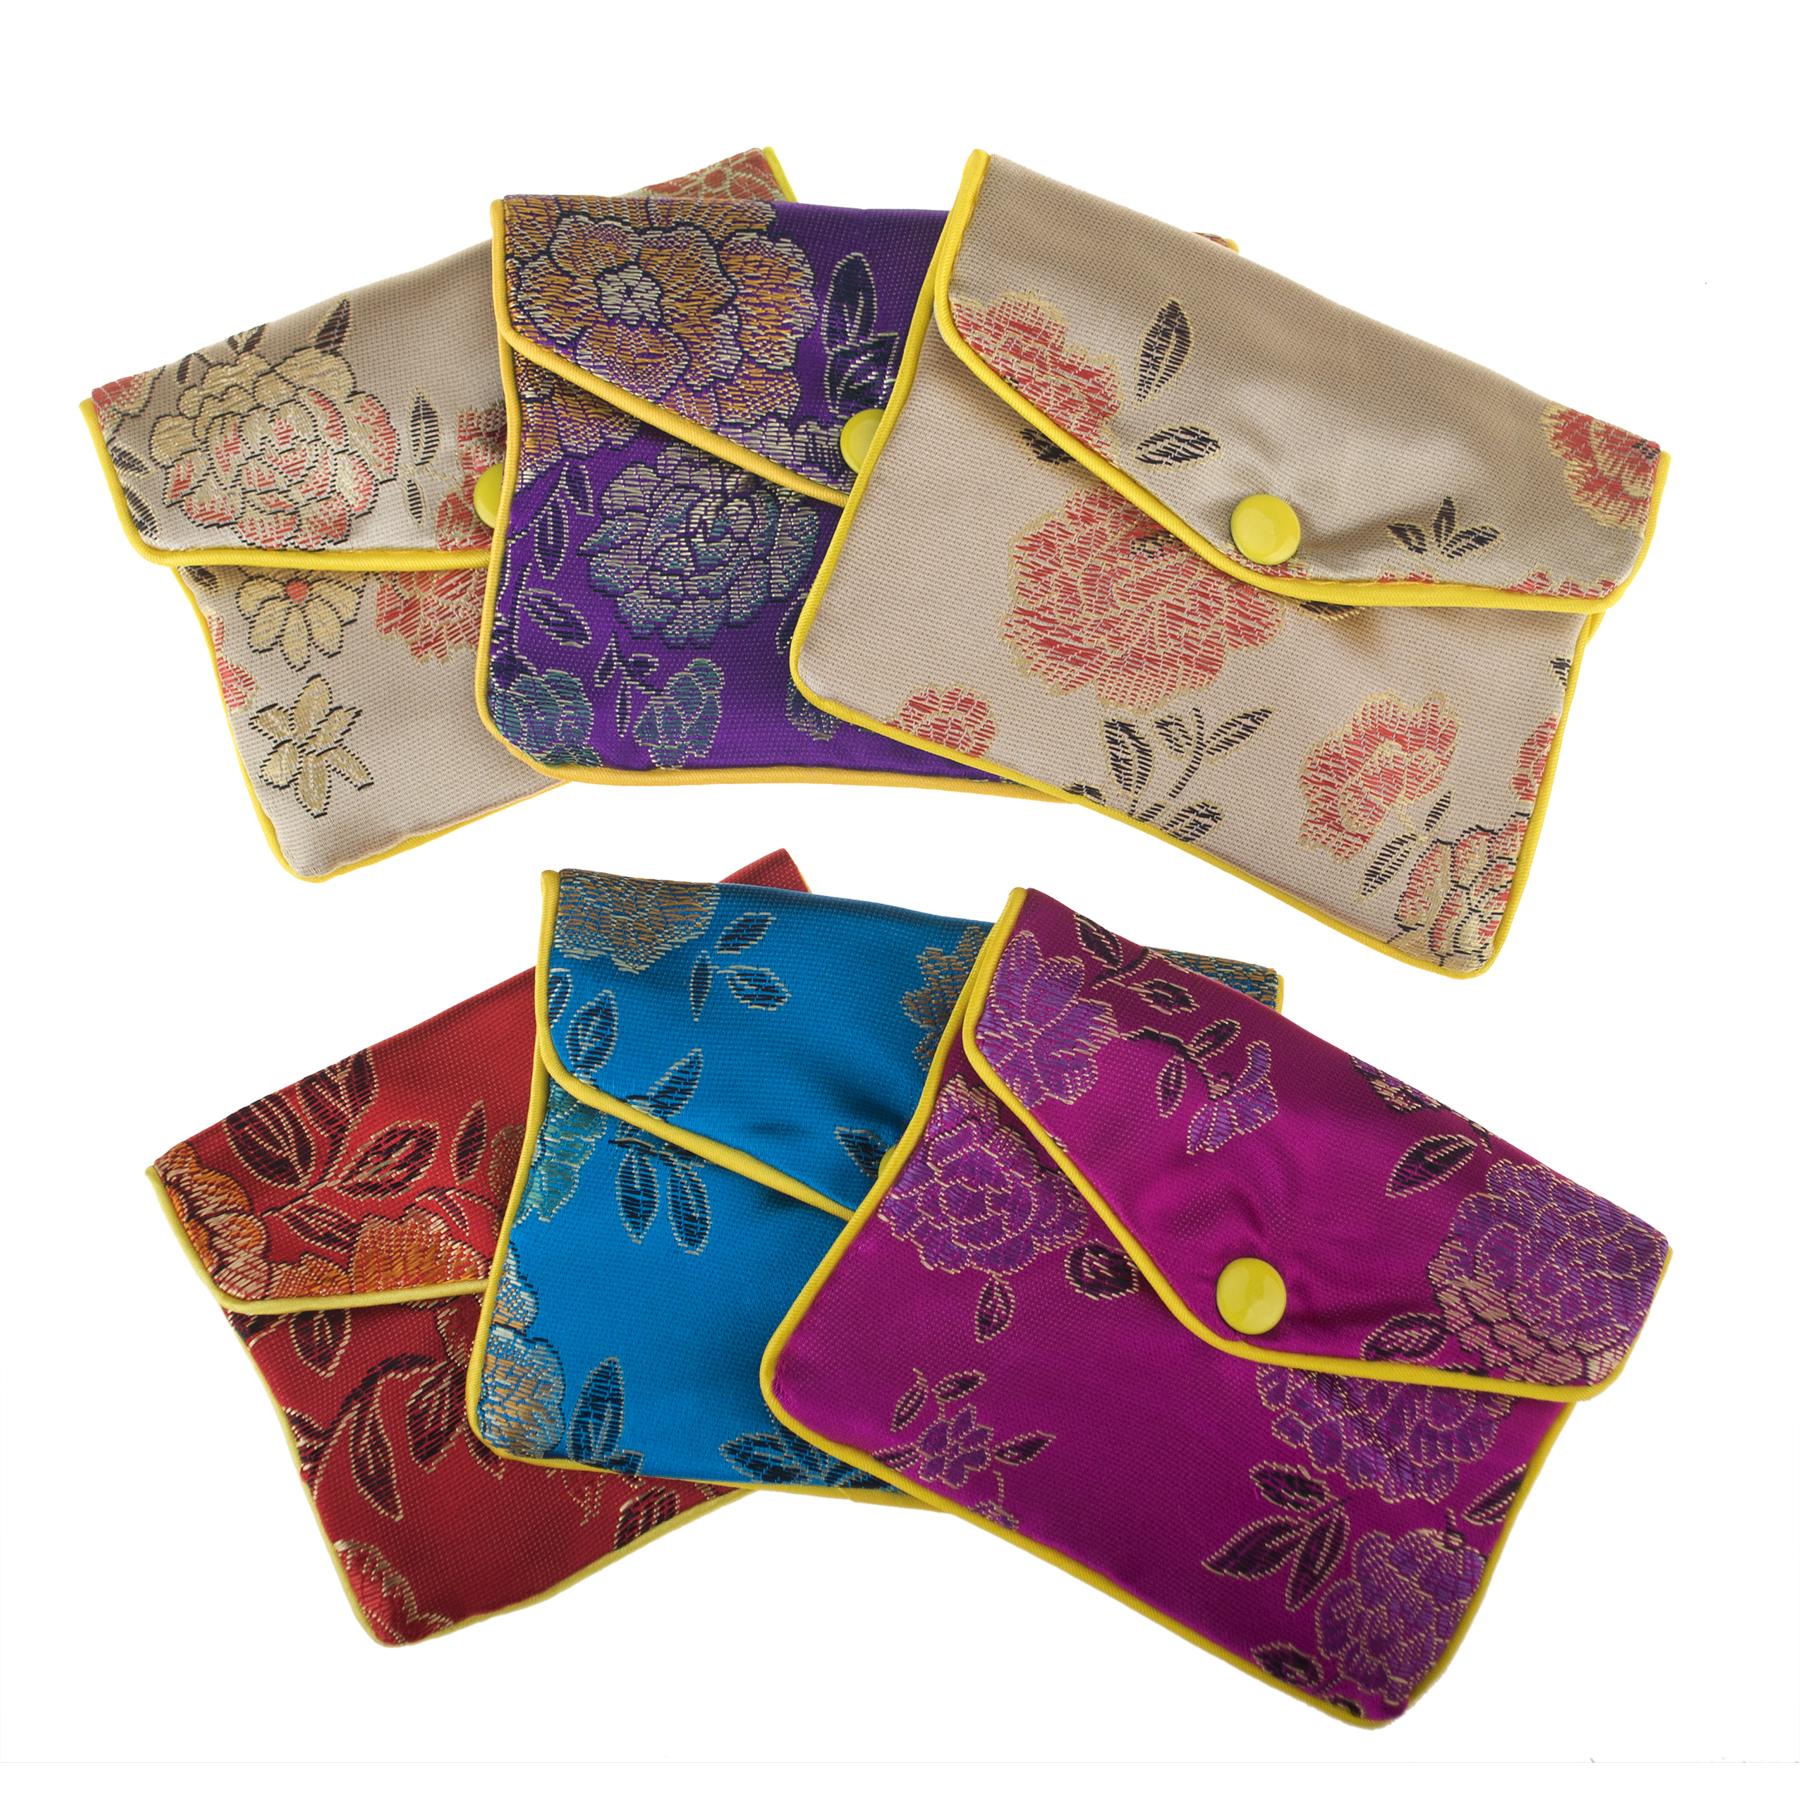 c4f6307dabea Aspire 24 Pieces Jewelry Pouch Zipper Purse Gift Bags Snap Closure 4 x 3  Inch